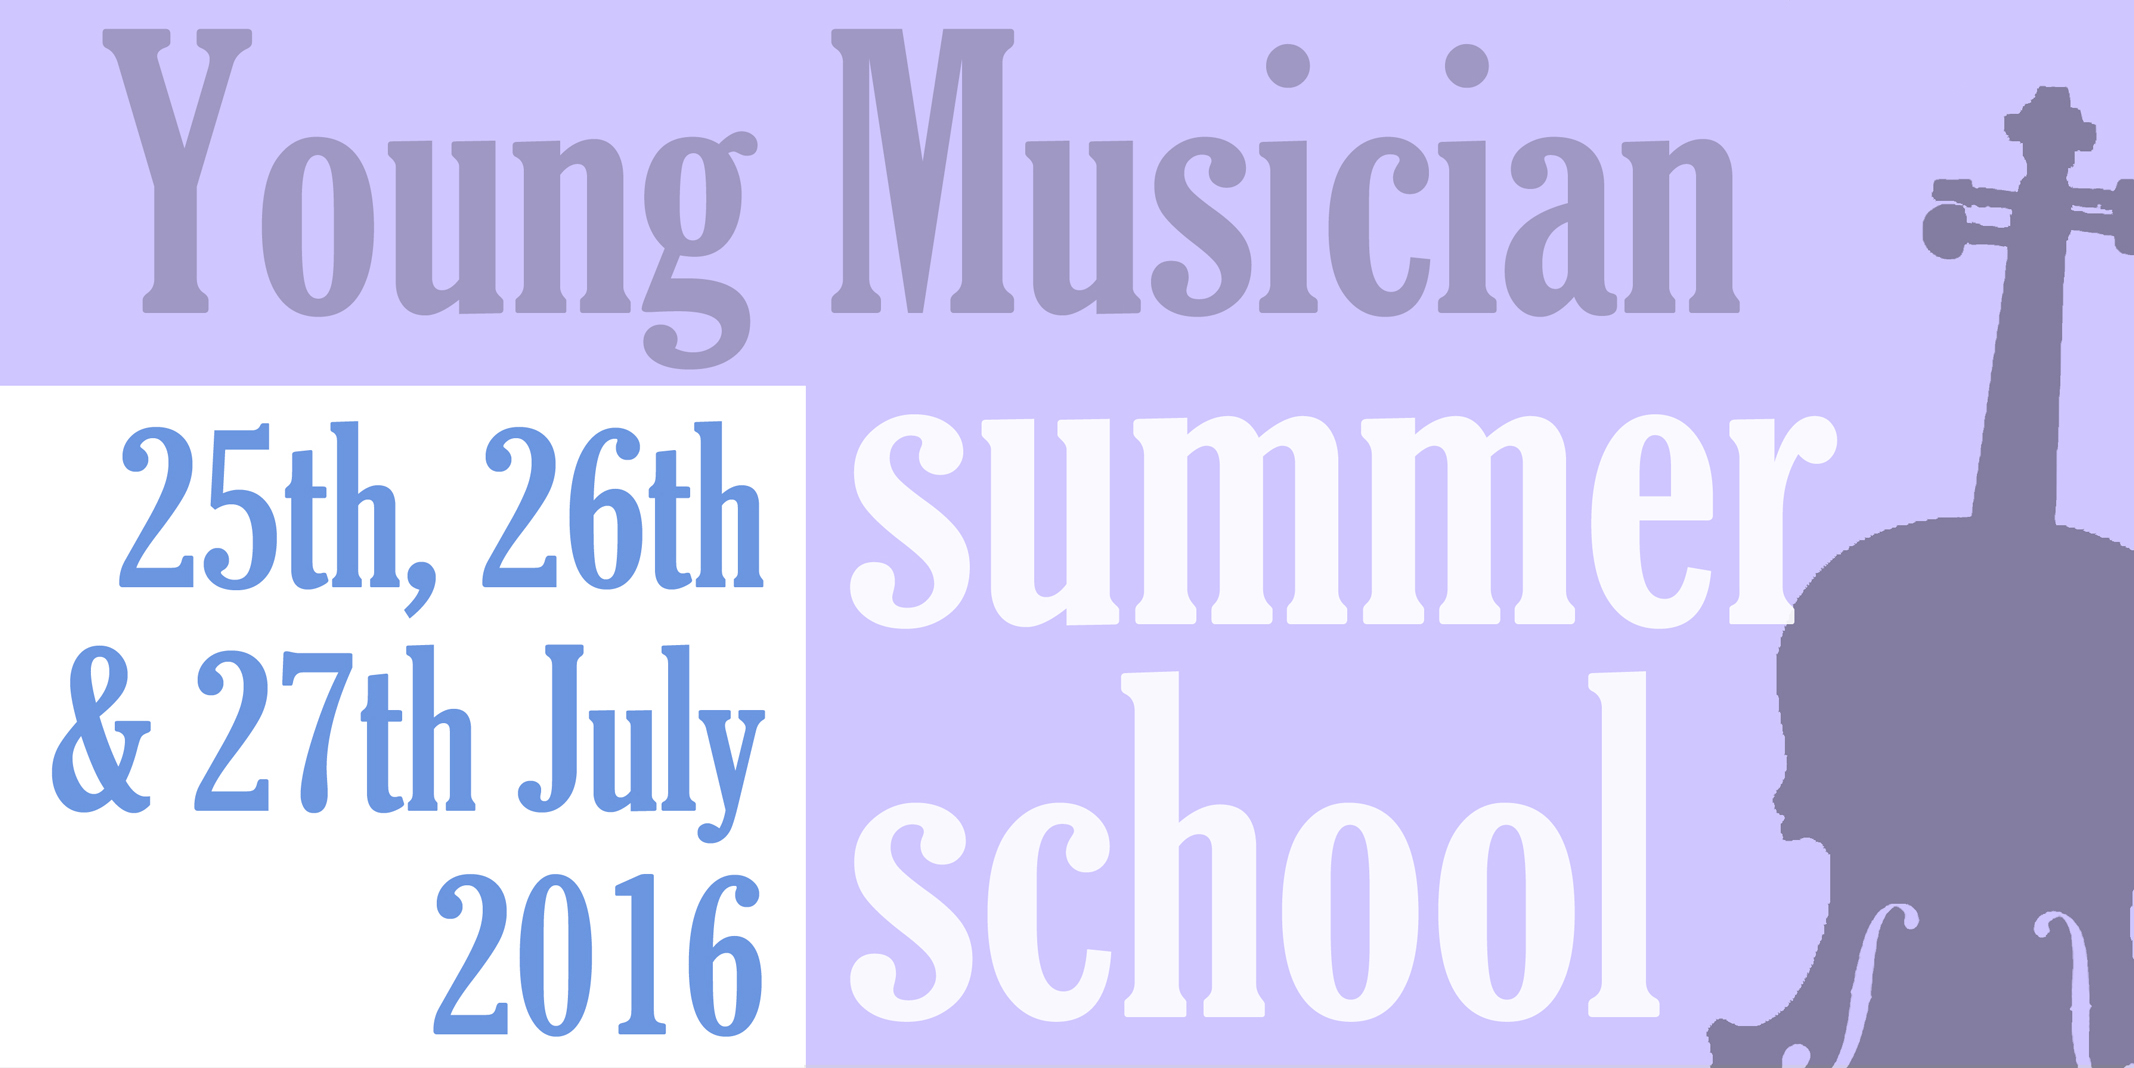 3453Young Musician Summer School